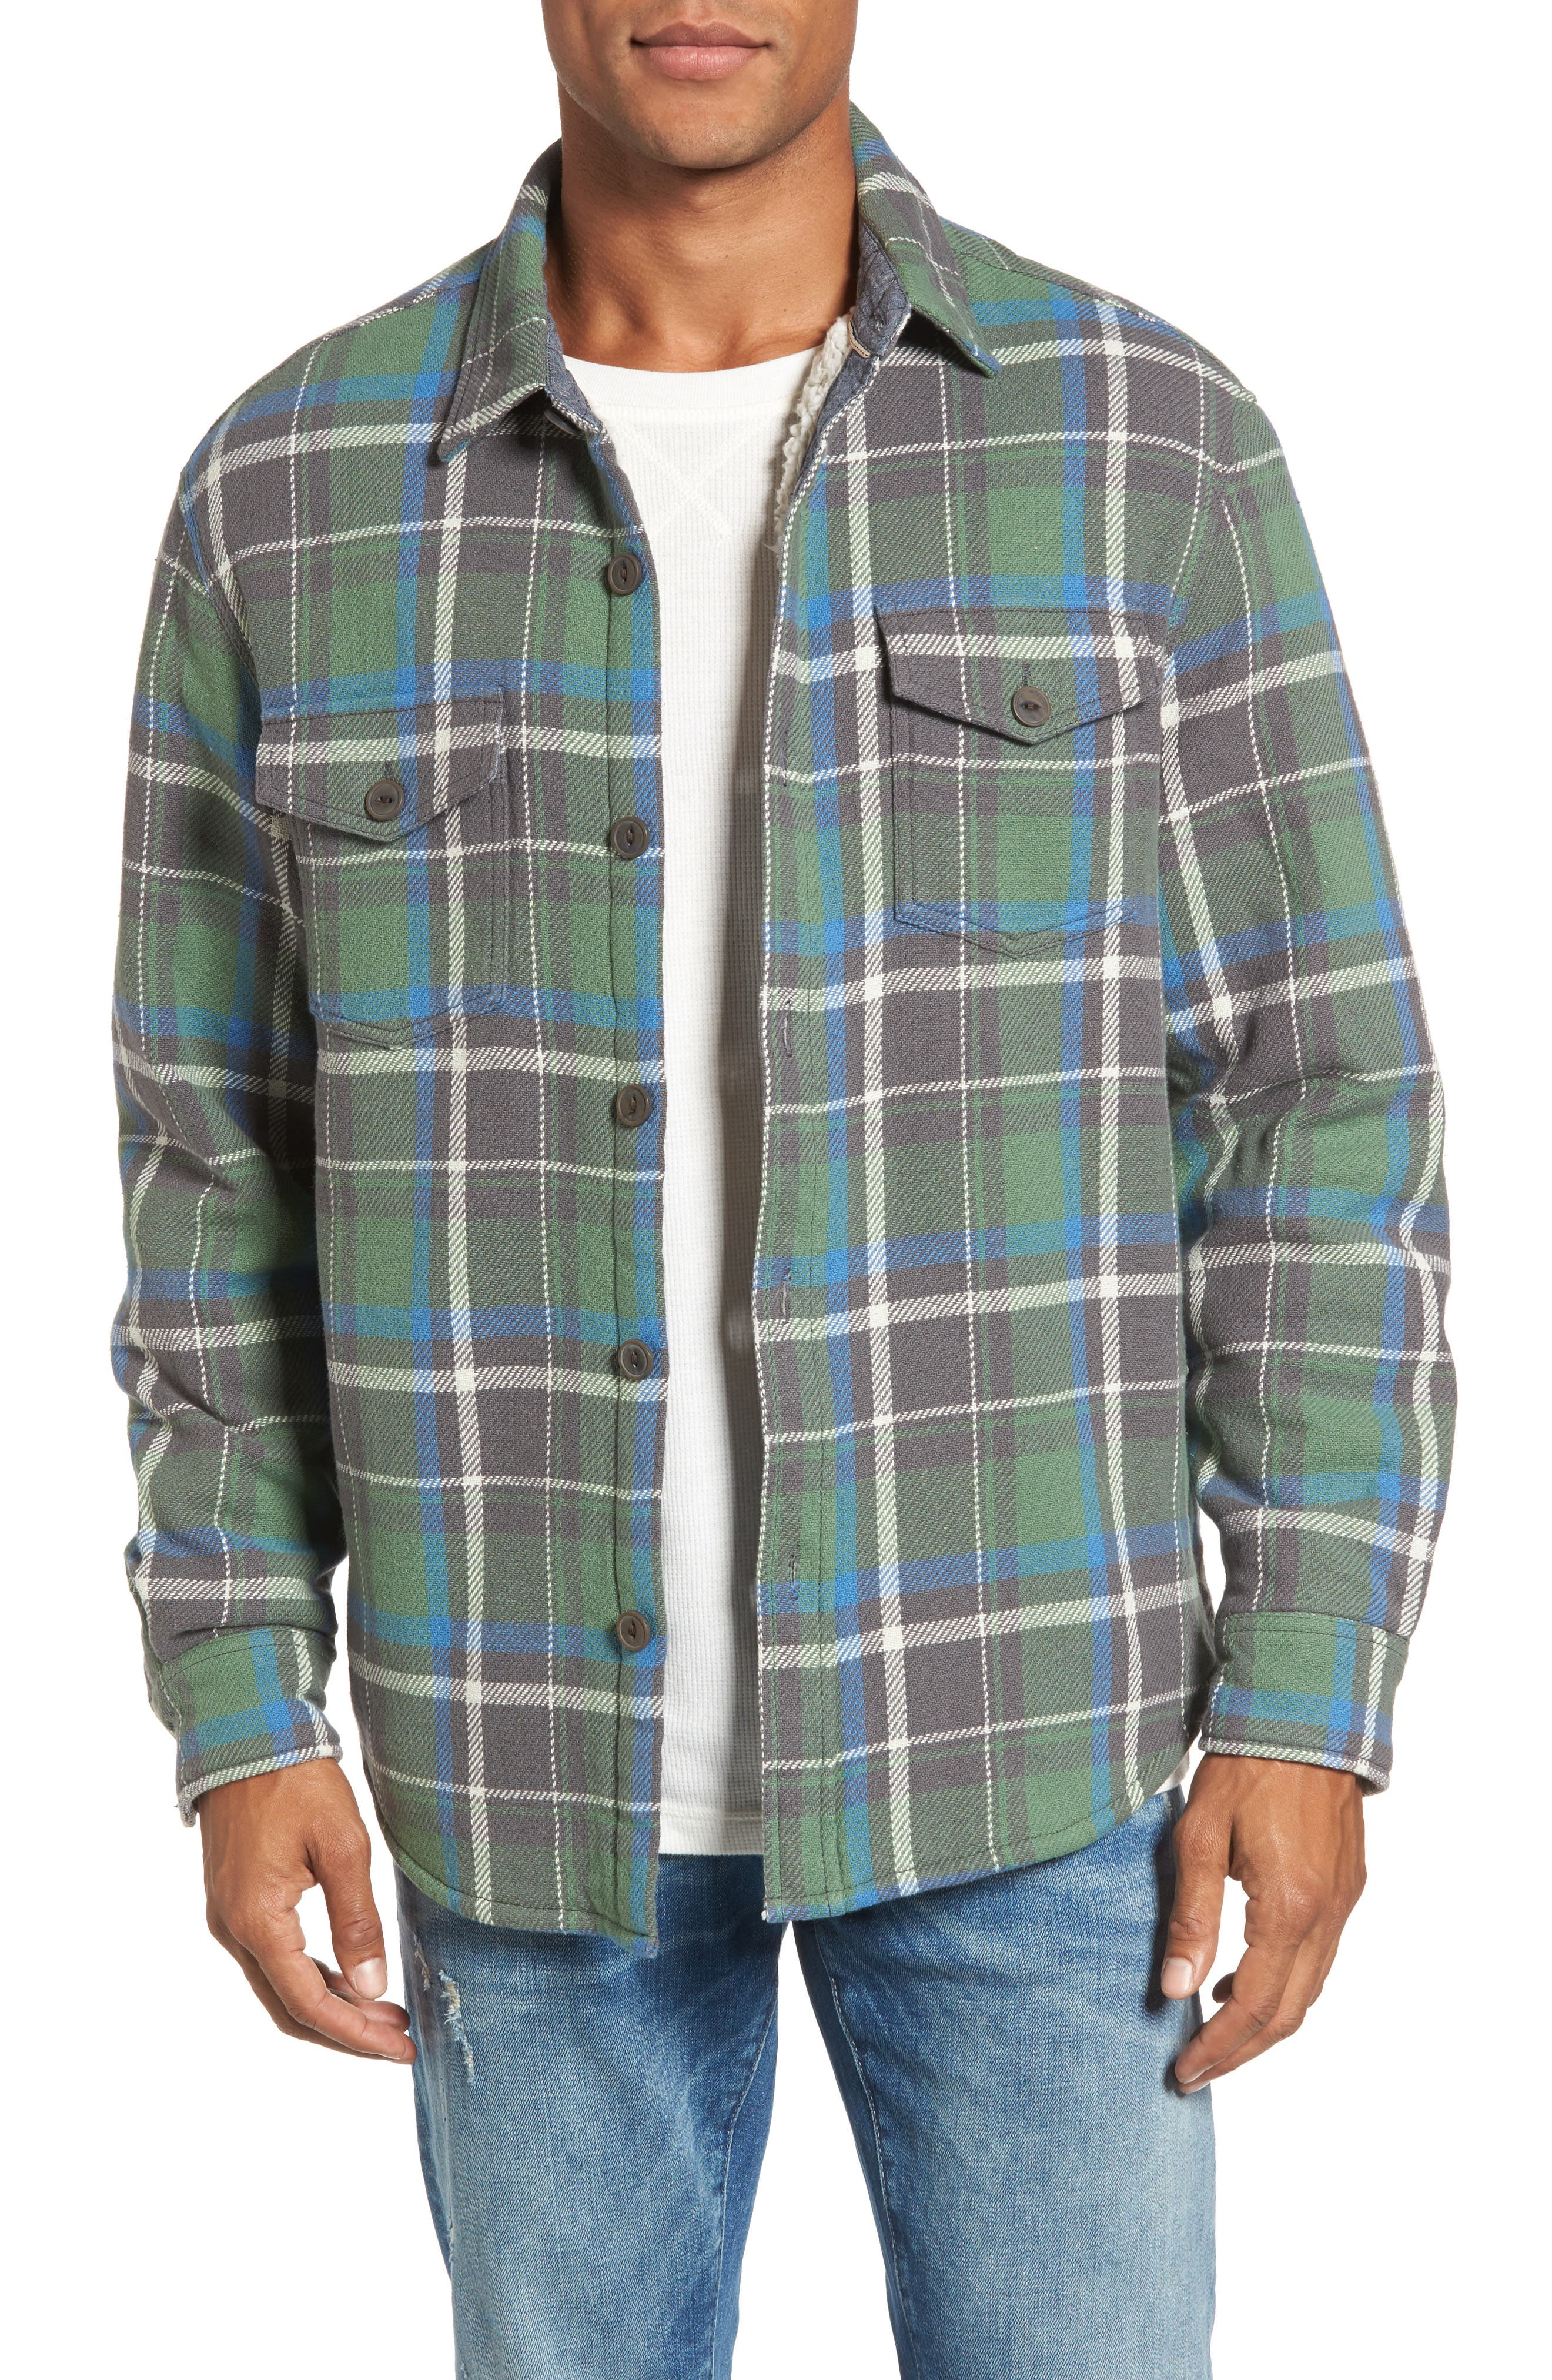 Main Image - True Grit Summit Hunter Plaid Faux Shearling Lined Shirt Jacket